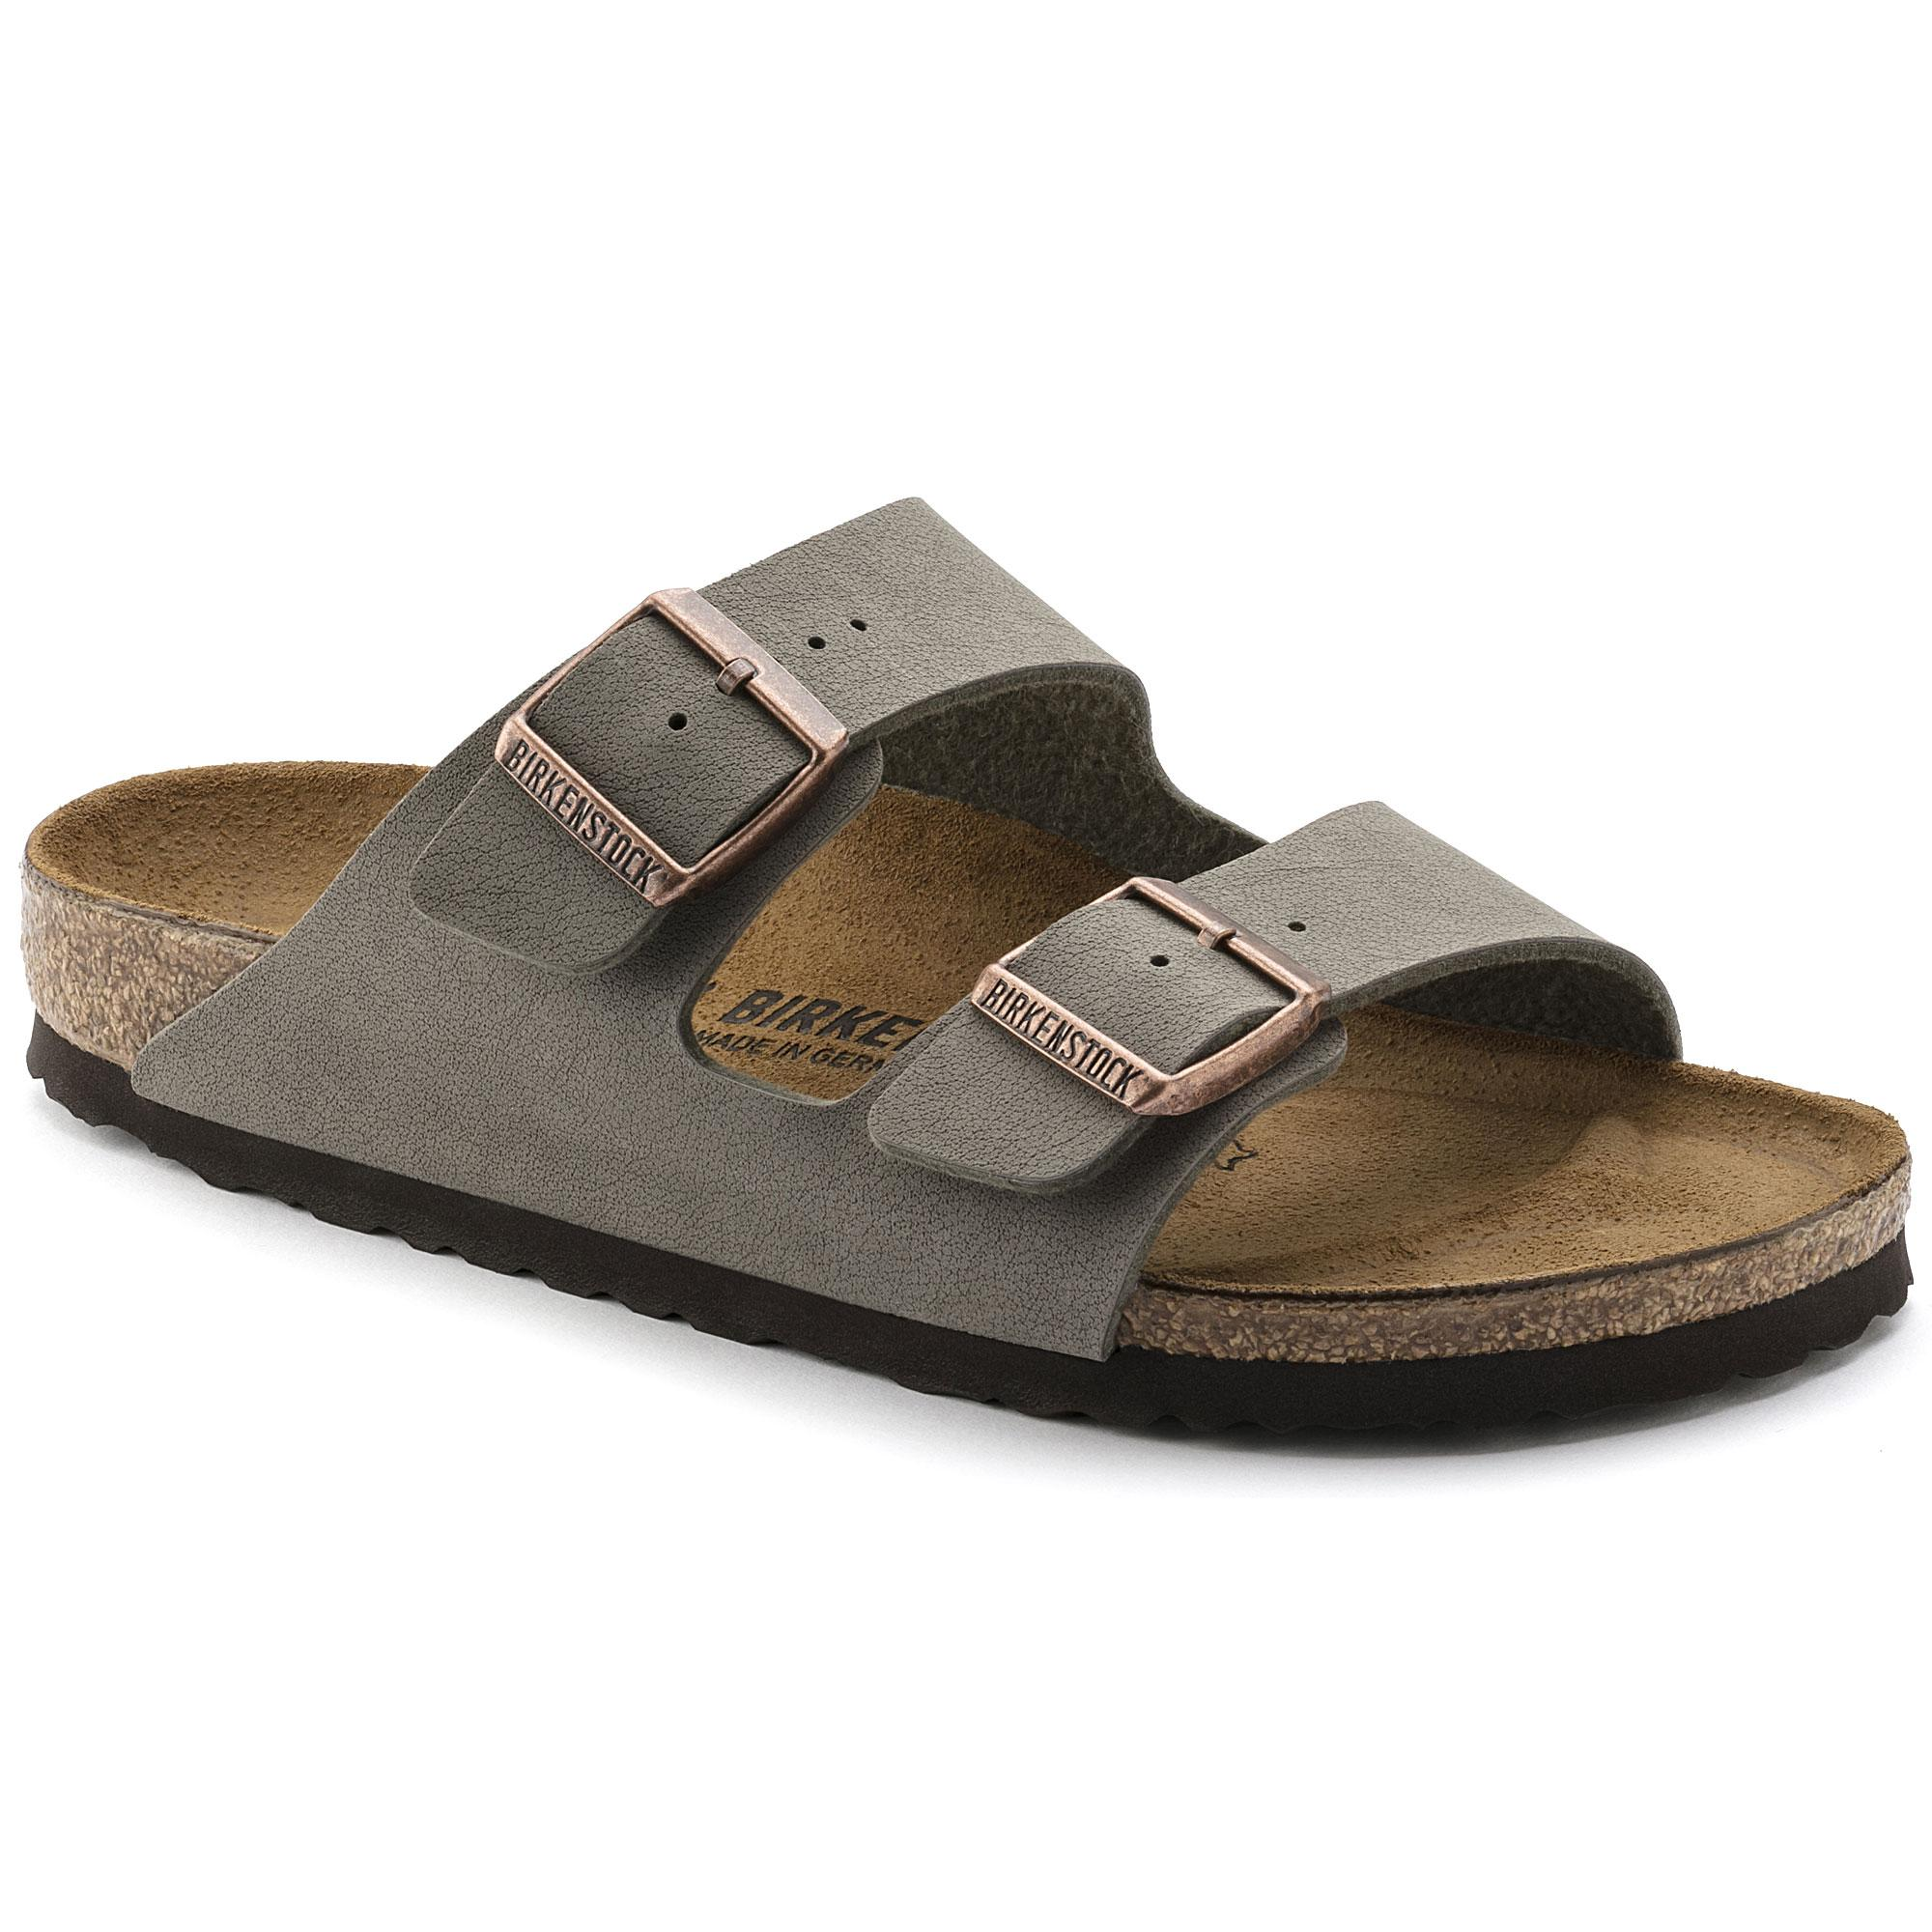 78df43a525f Birkenstock Mens Sandals Plastic price in Singapore